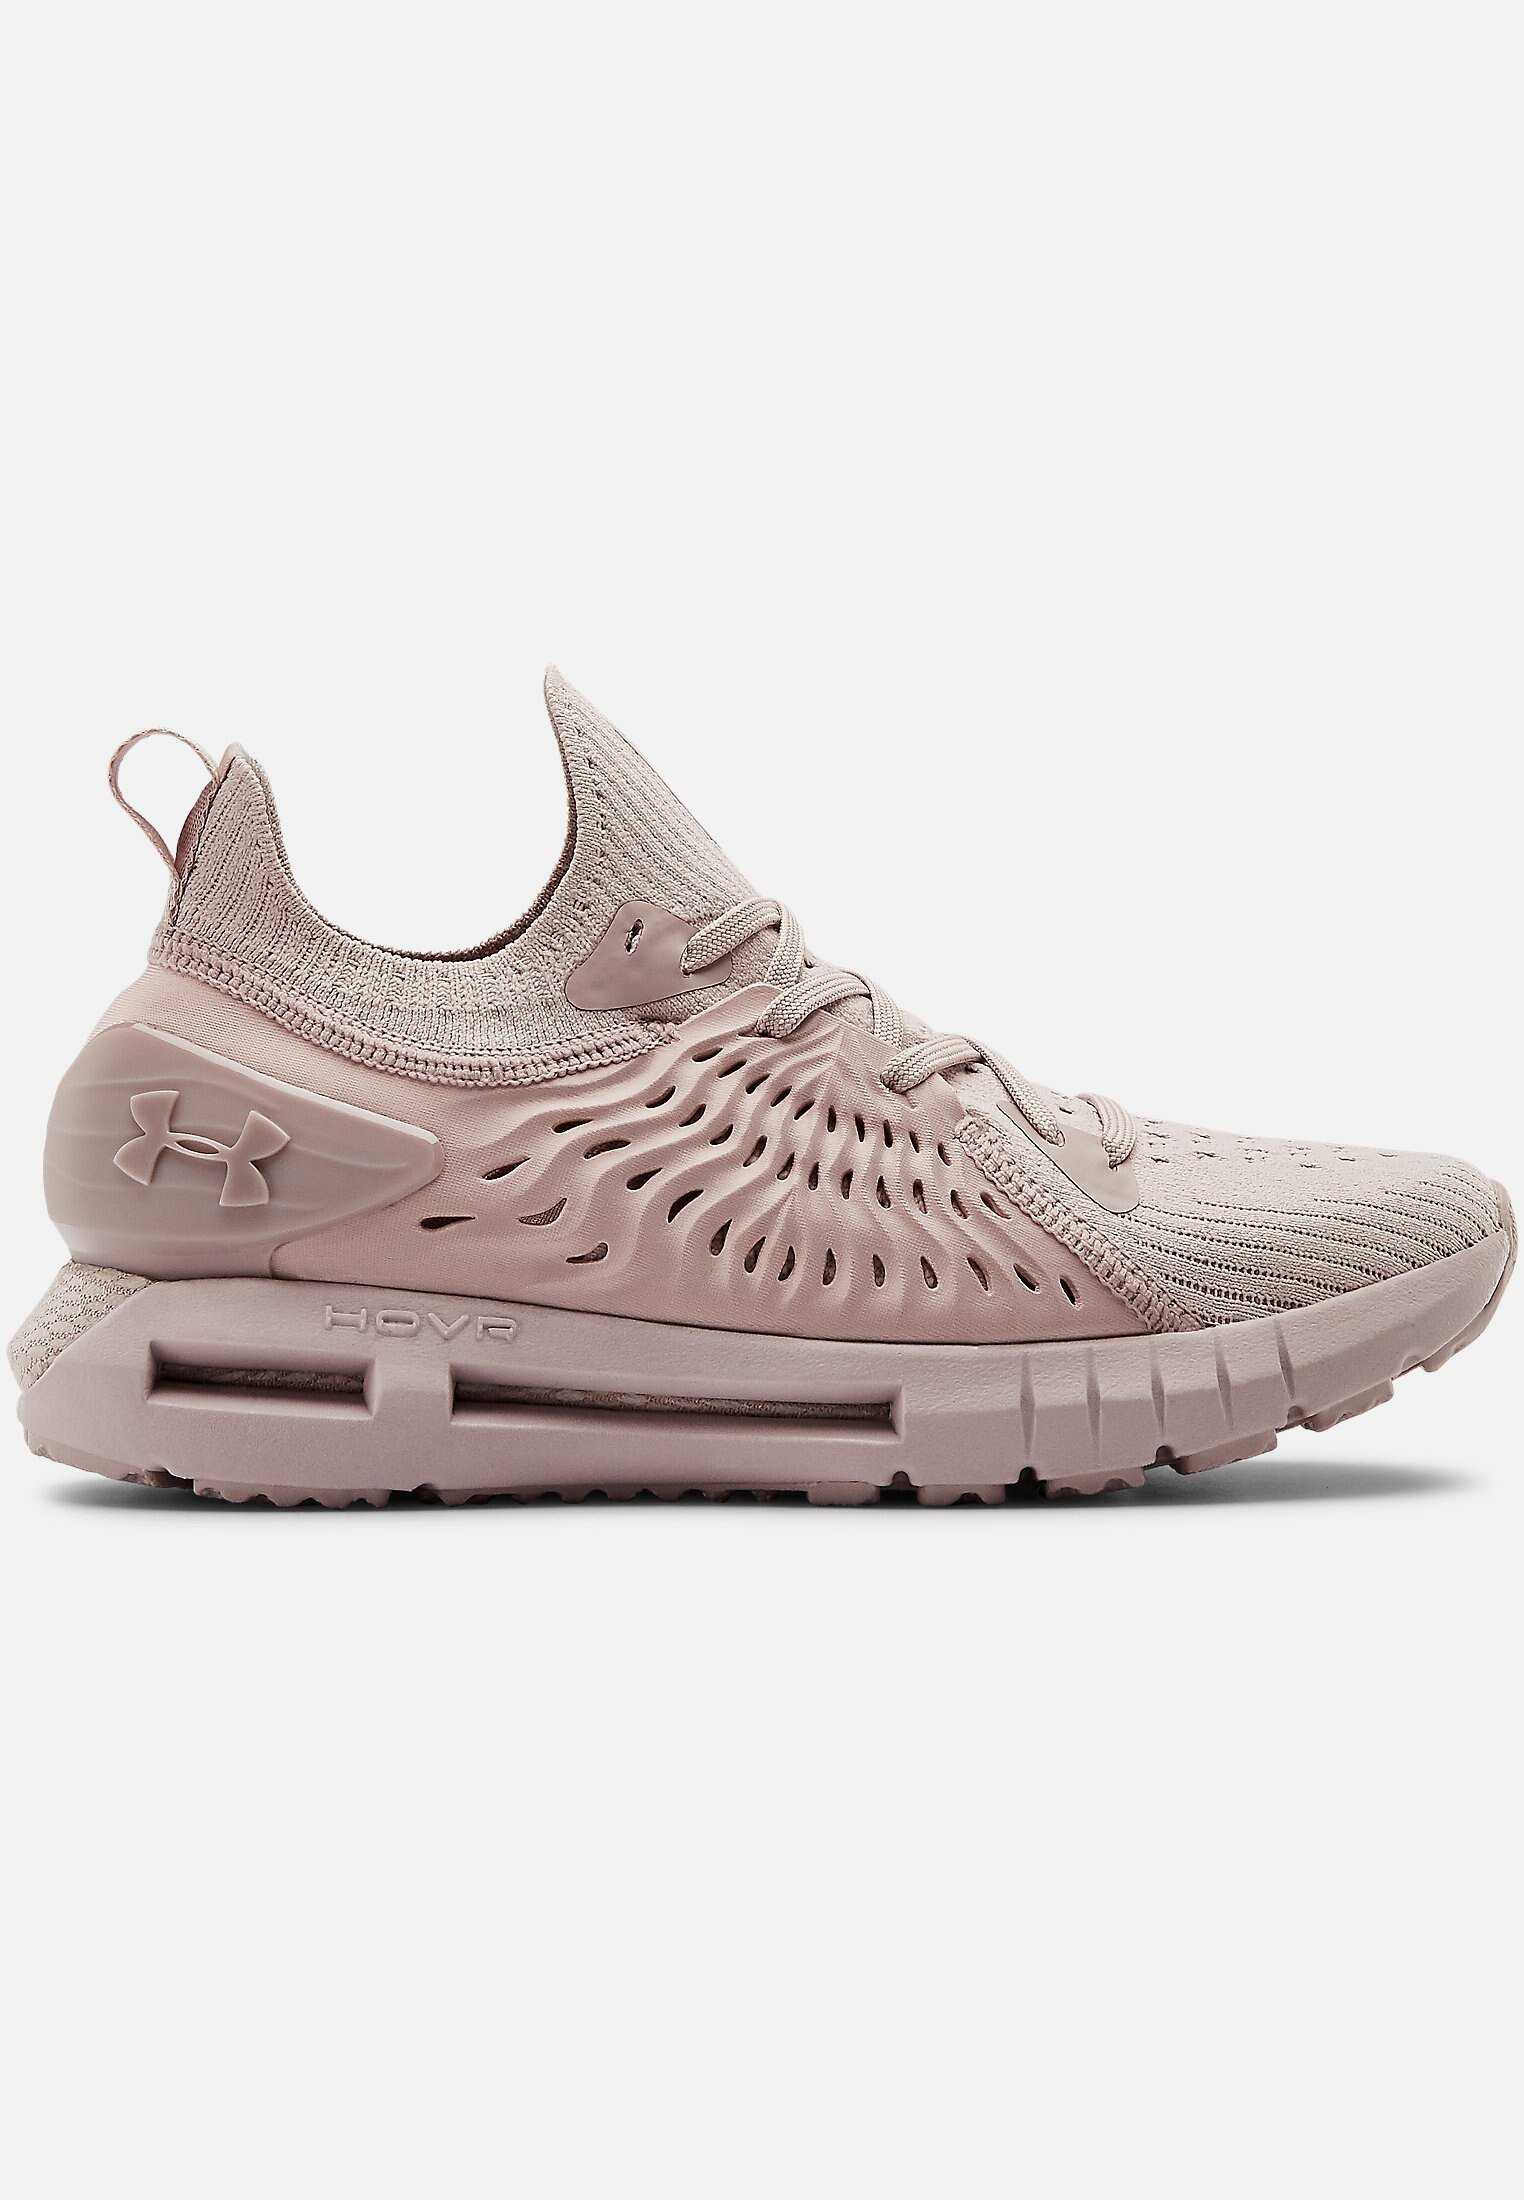 Under Armour Hovr Phantom Rn Neutral Running Shoes Dash Pink Pink Zalando De